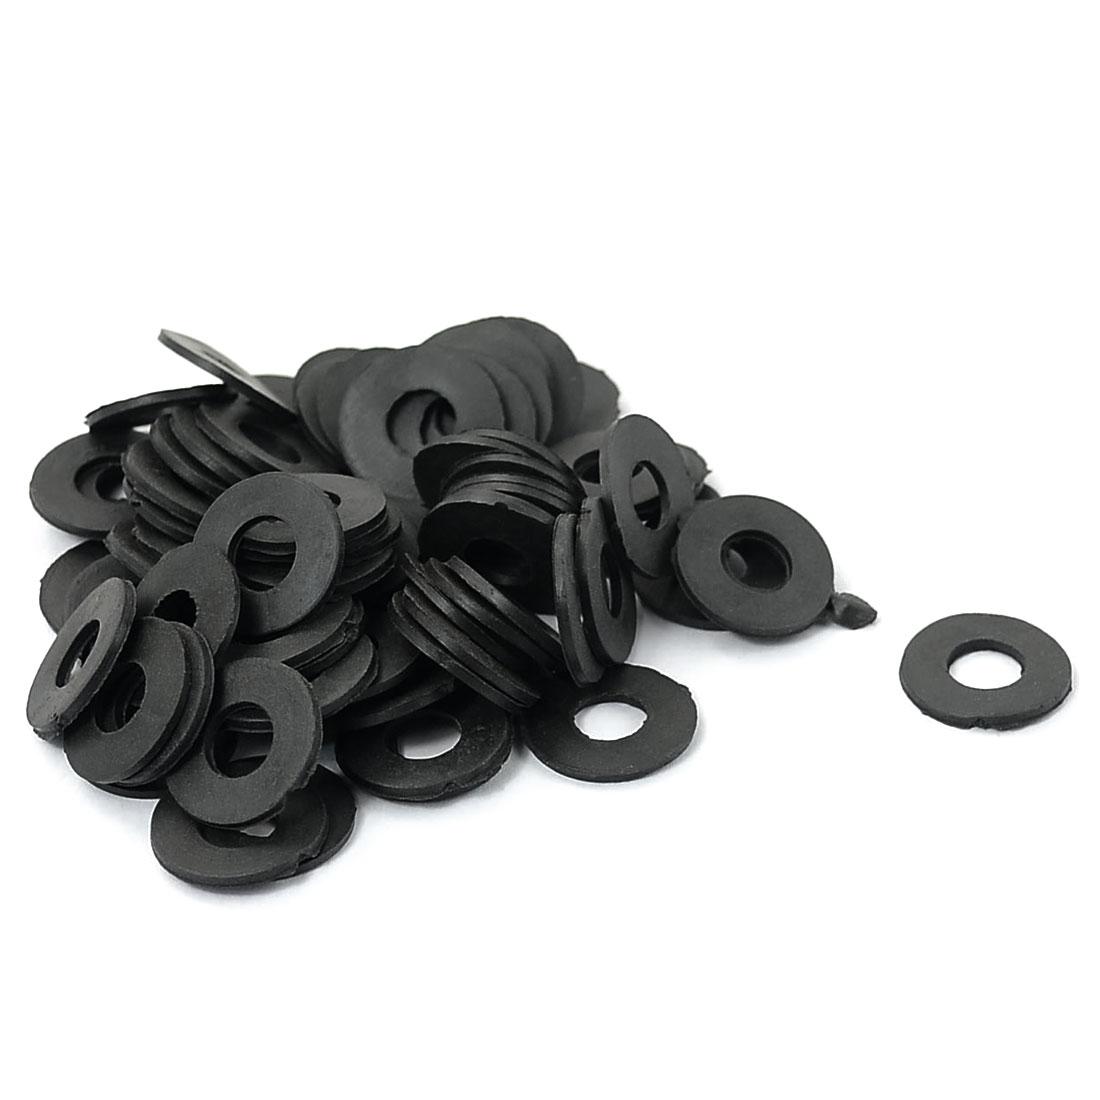 18mm x 8mm x 2mm Rubber Washer O Ring Seal Tap Sink Water Tube Sealing Gasket Black 80PCS